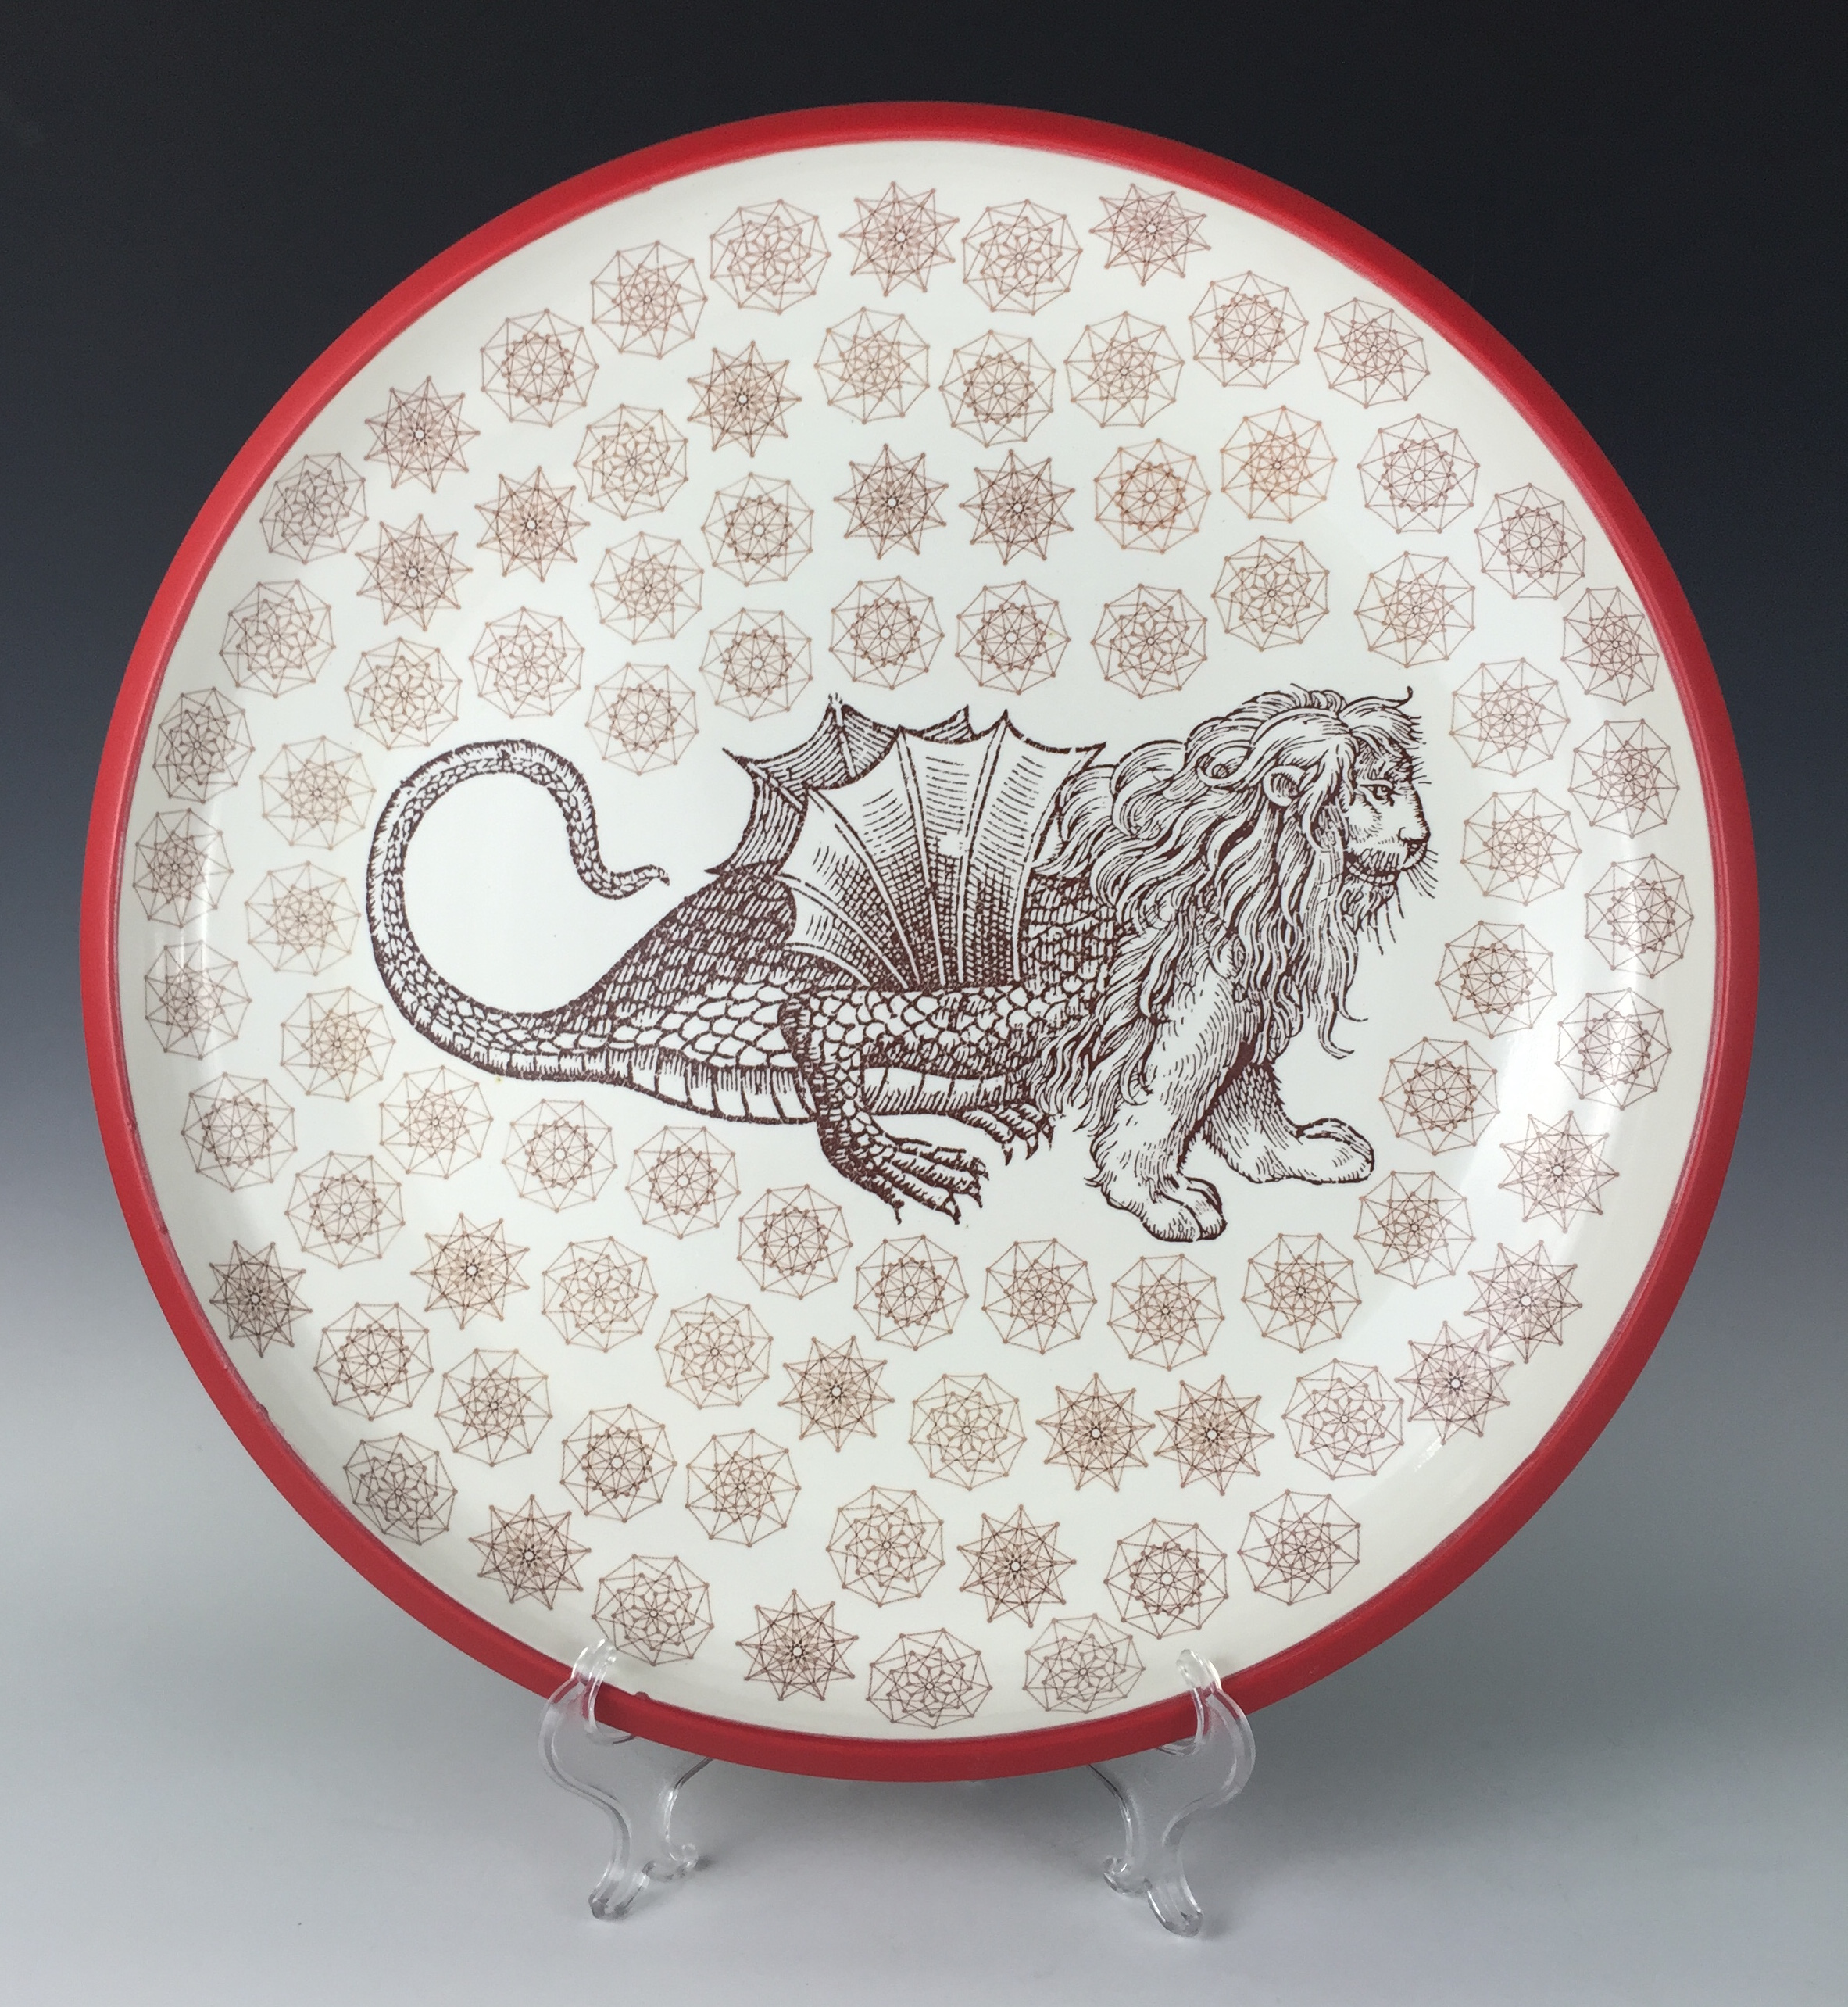 dragon-lion khymera platter.jpg